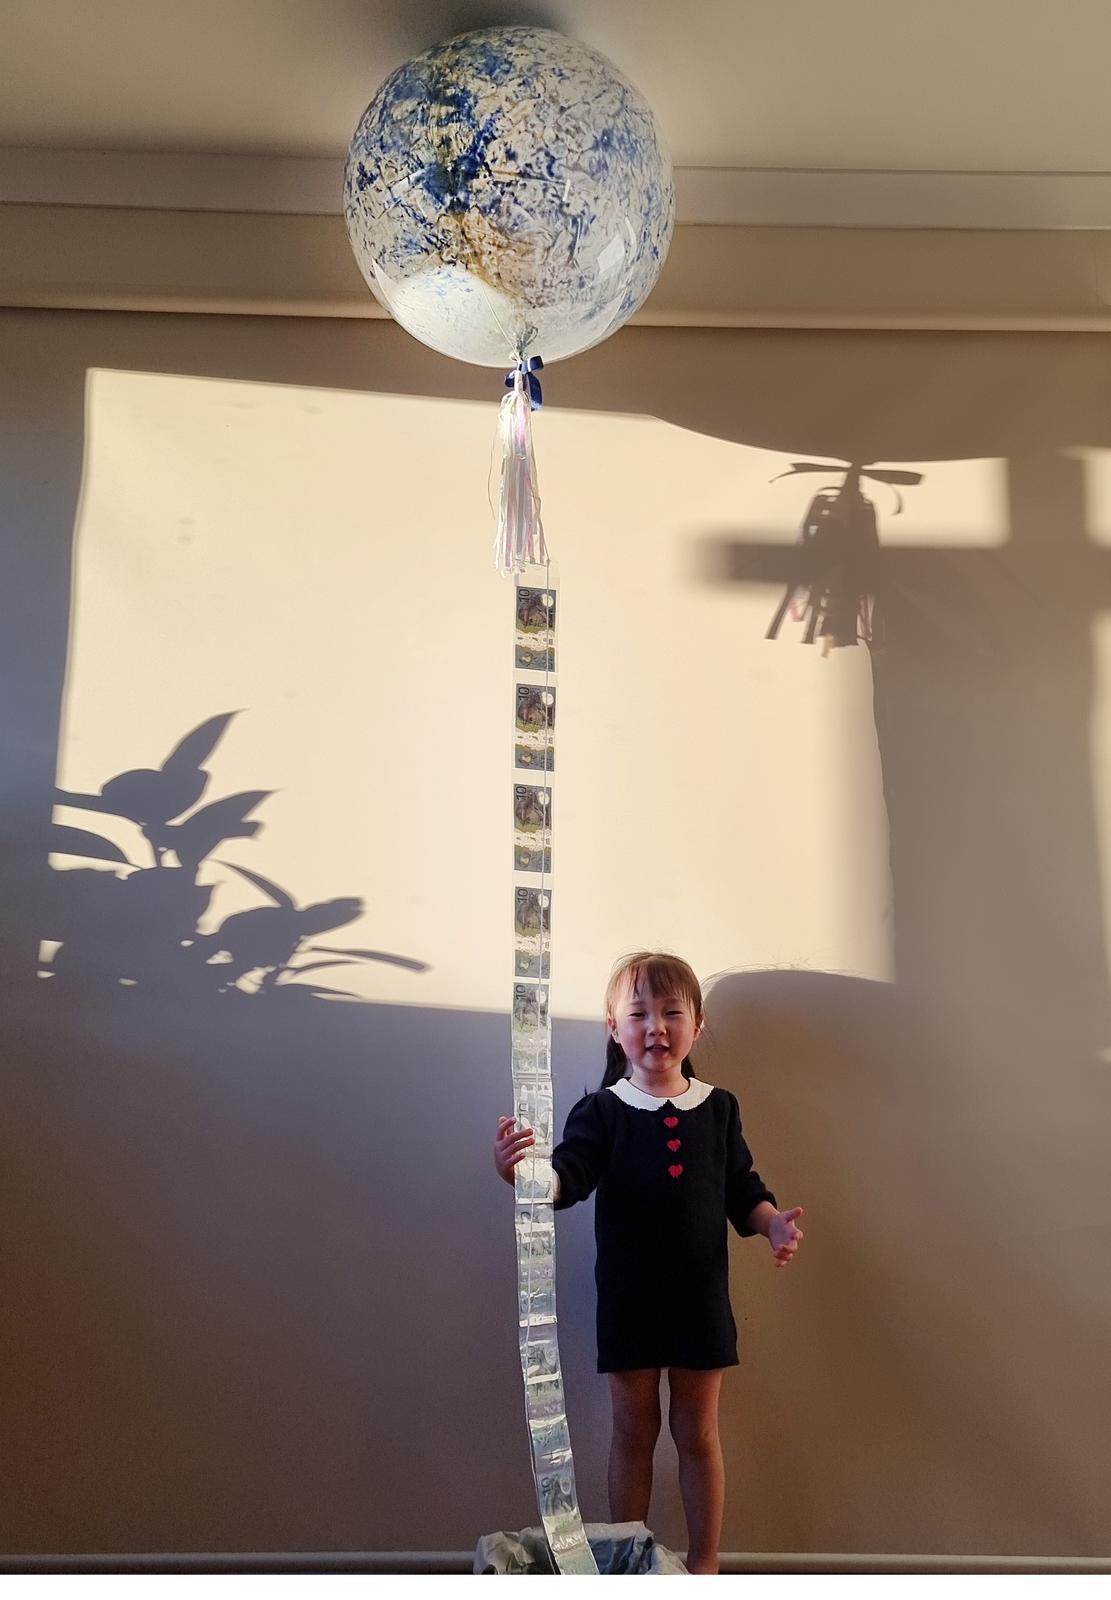 Mega helium paintballoon with money gifts